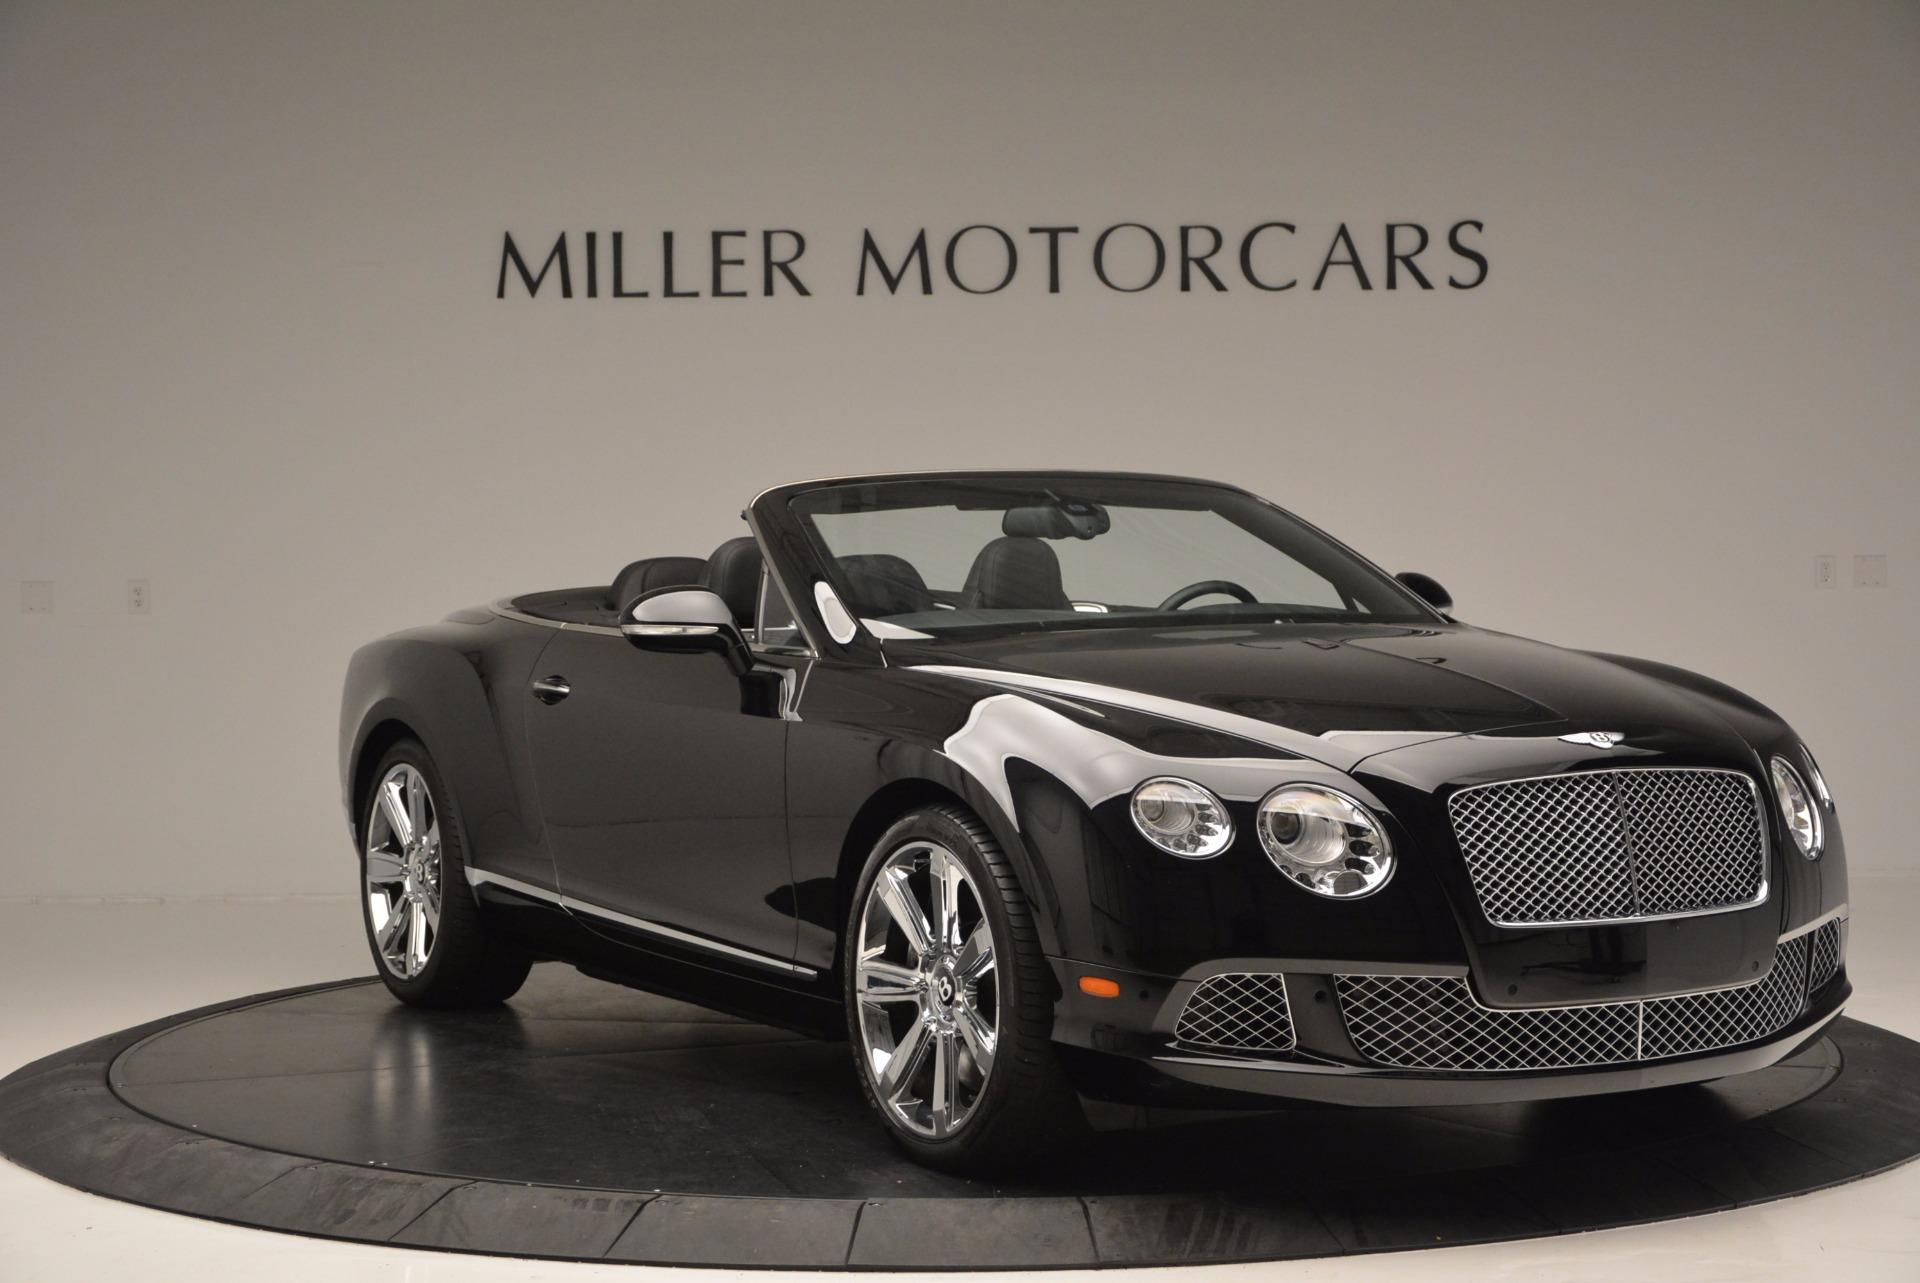 Used 2013 Bentley Continental GTC  For Sale In Westport, CT 646_p12